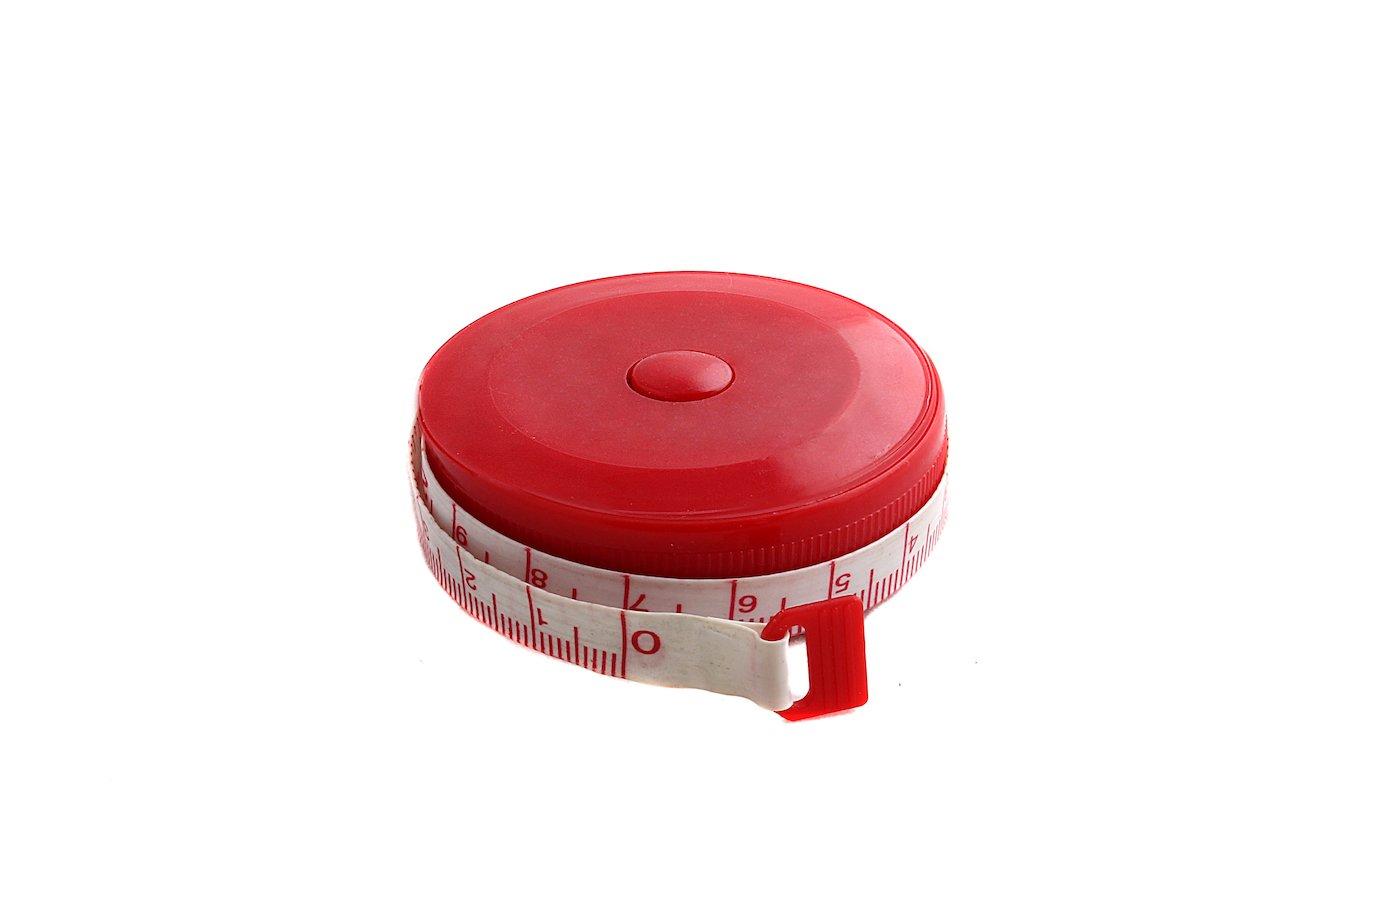 Аксессуары для швейных машин VETTA 308-003 Сантиметр 1.5м